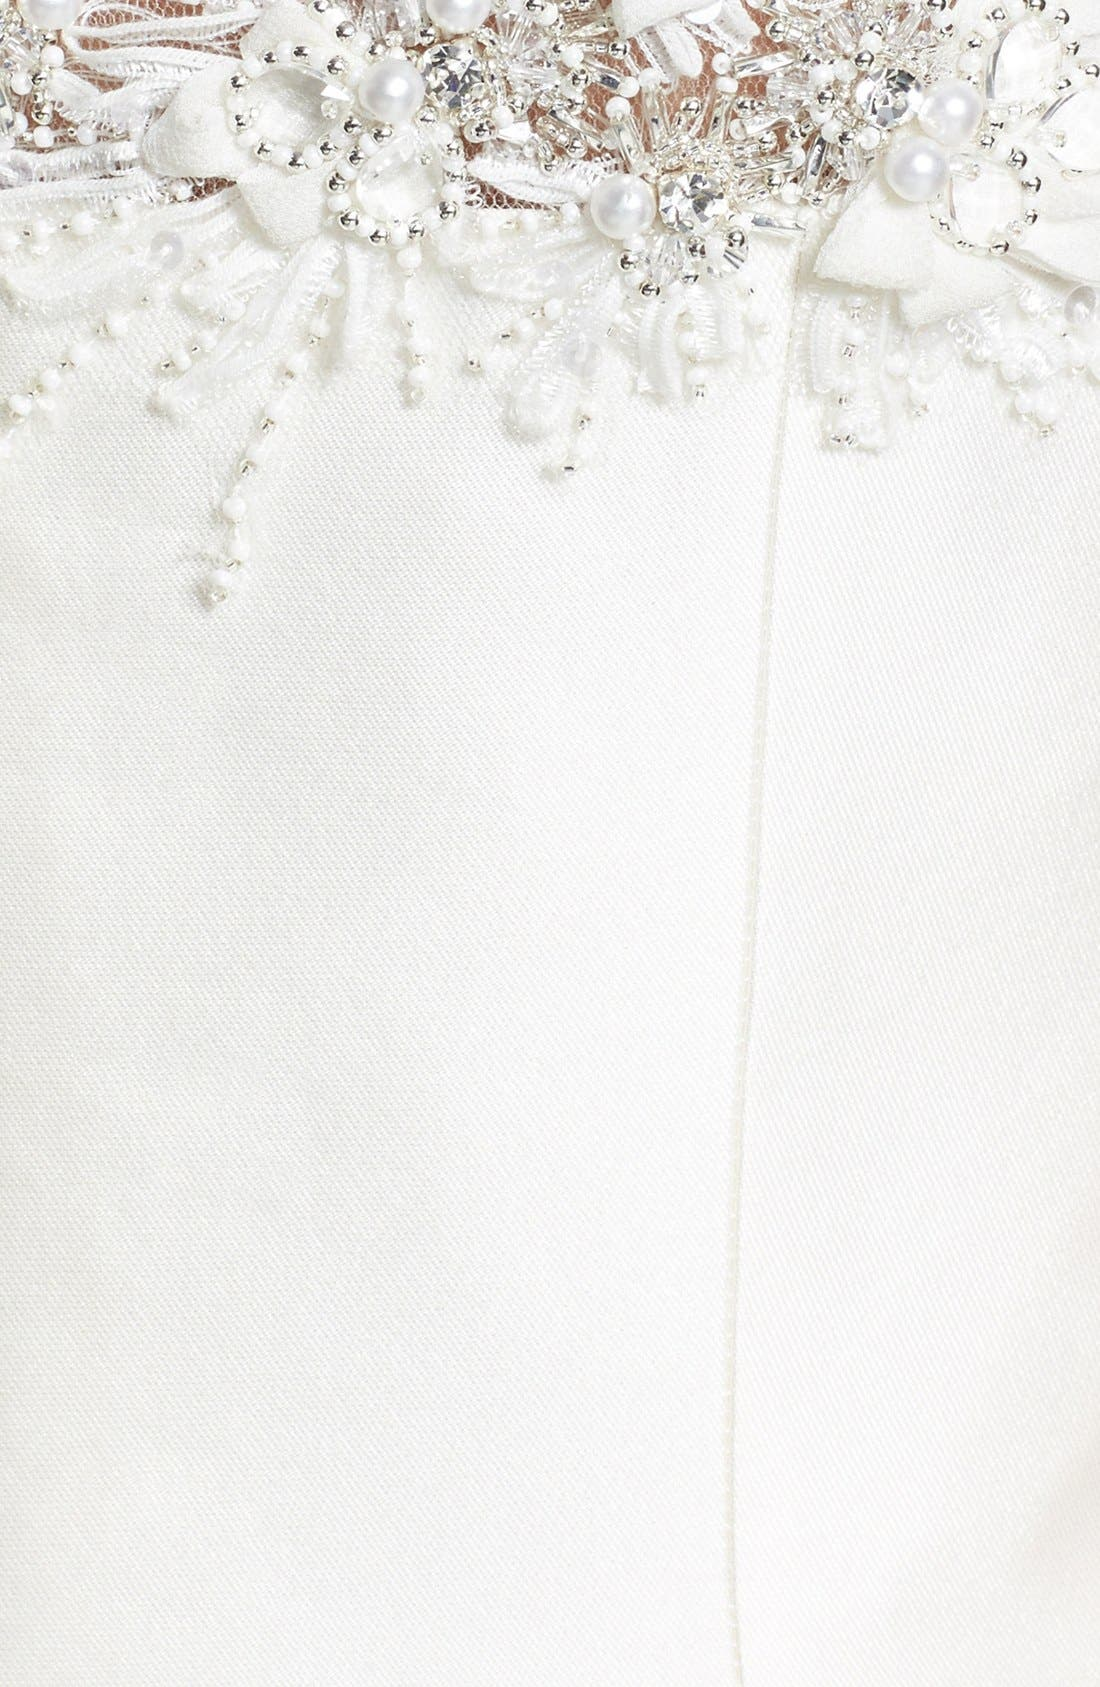 Alternate Image 3  - Badgley Mischka Bridal 'Audrey' Cap Sleeve Embellished Mermaid Dress (In Stores Only)